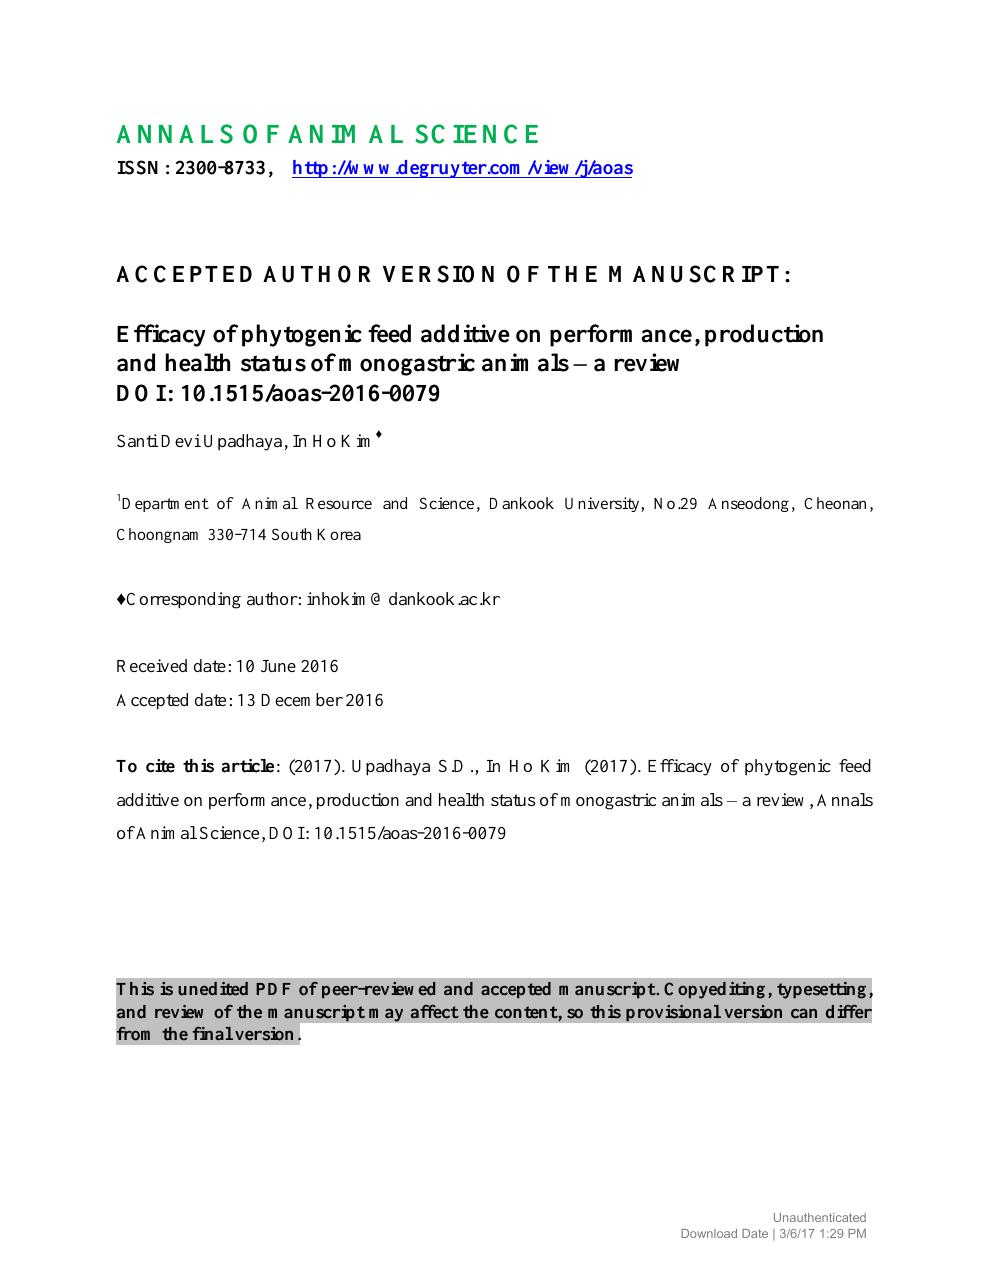 Efficacy of phytogenic feed additive on performance